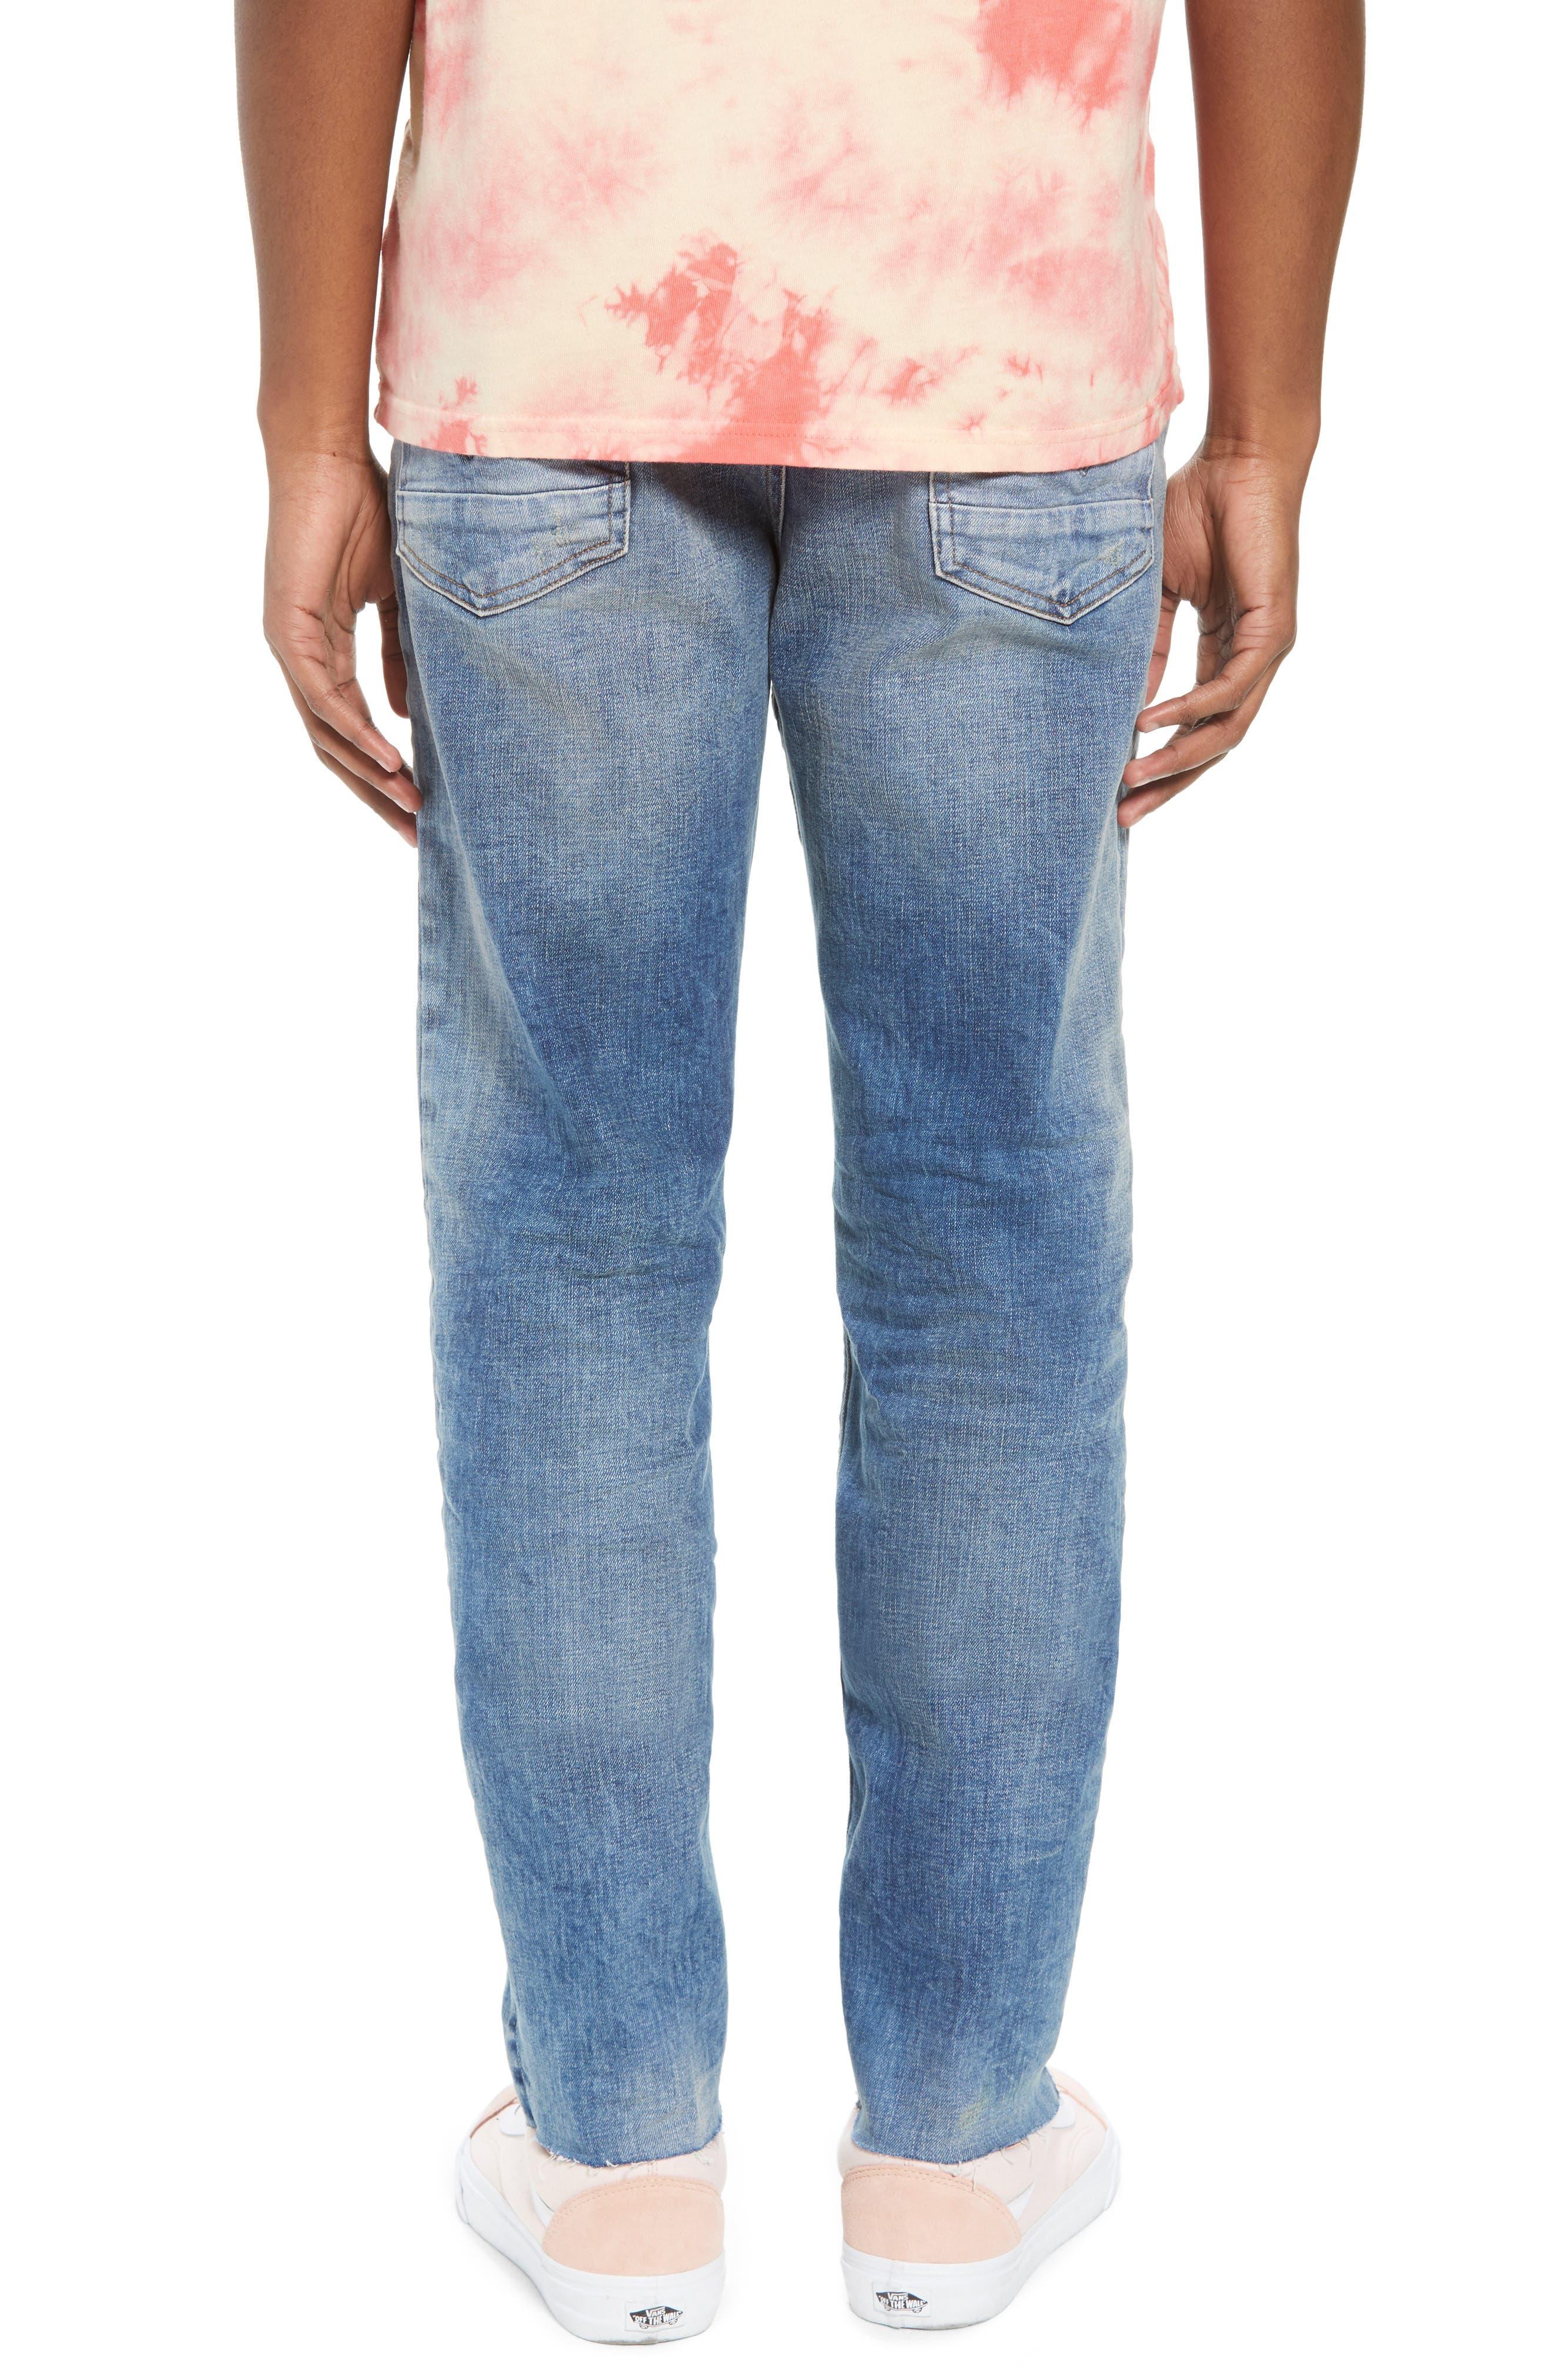 Sartor Slouchy Skinny Fit Jeans,                             Alternate thumbnail 2, color,                             Los Feliz